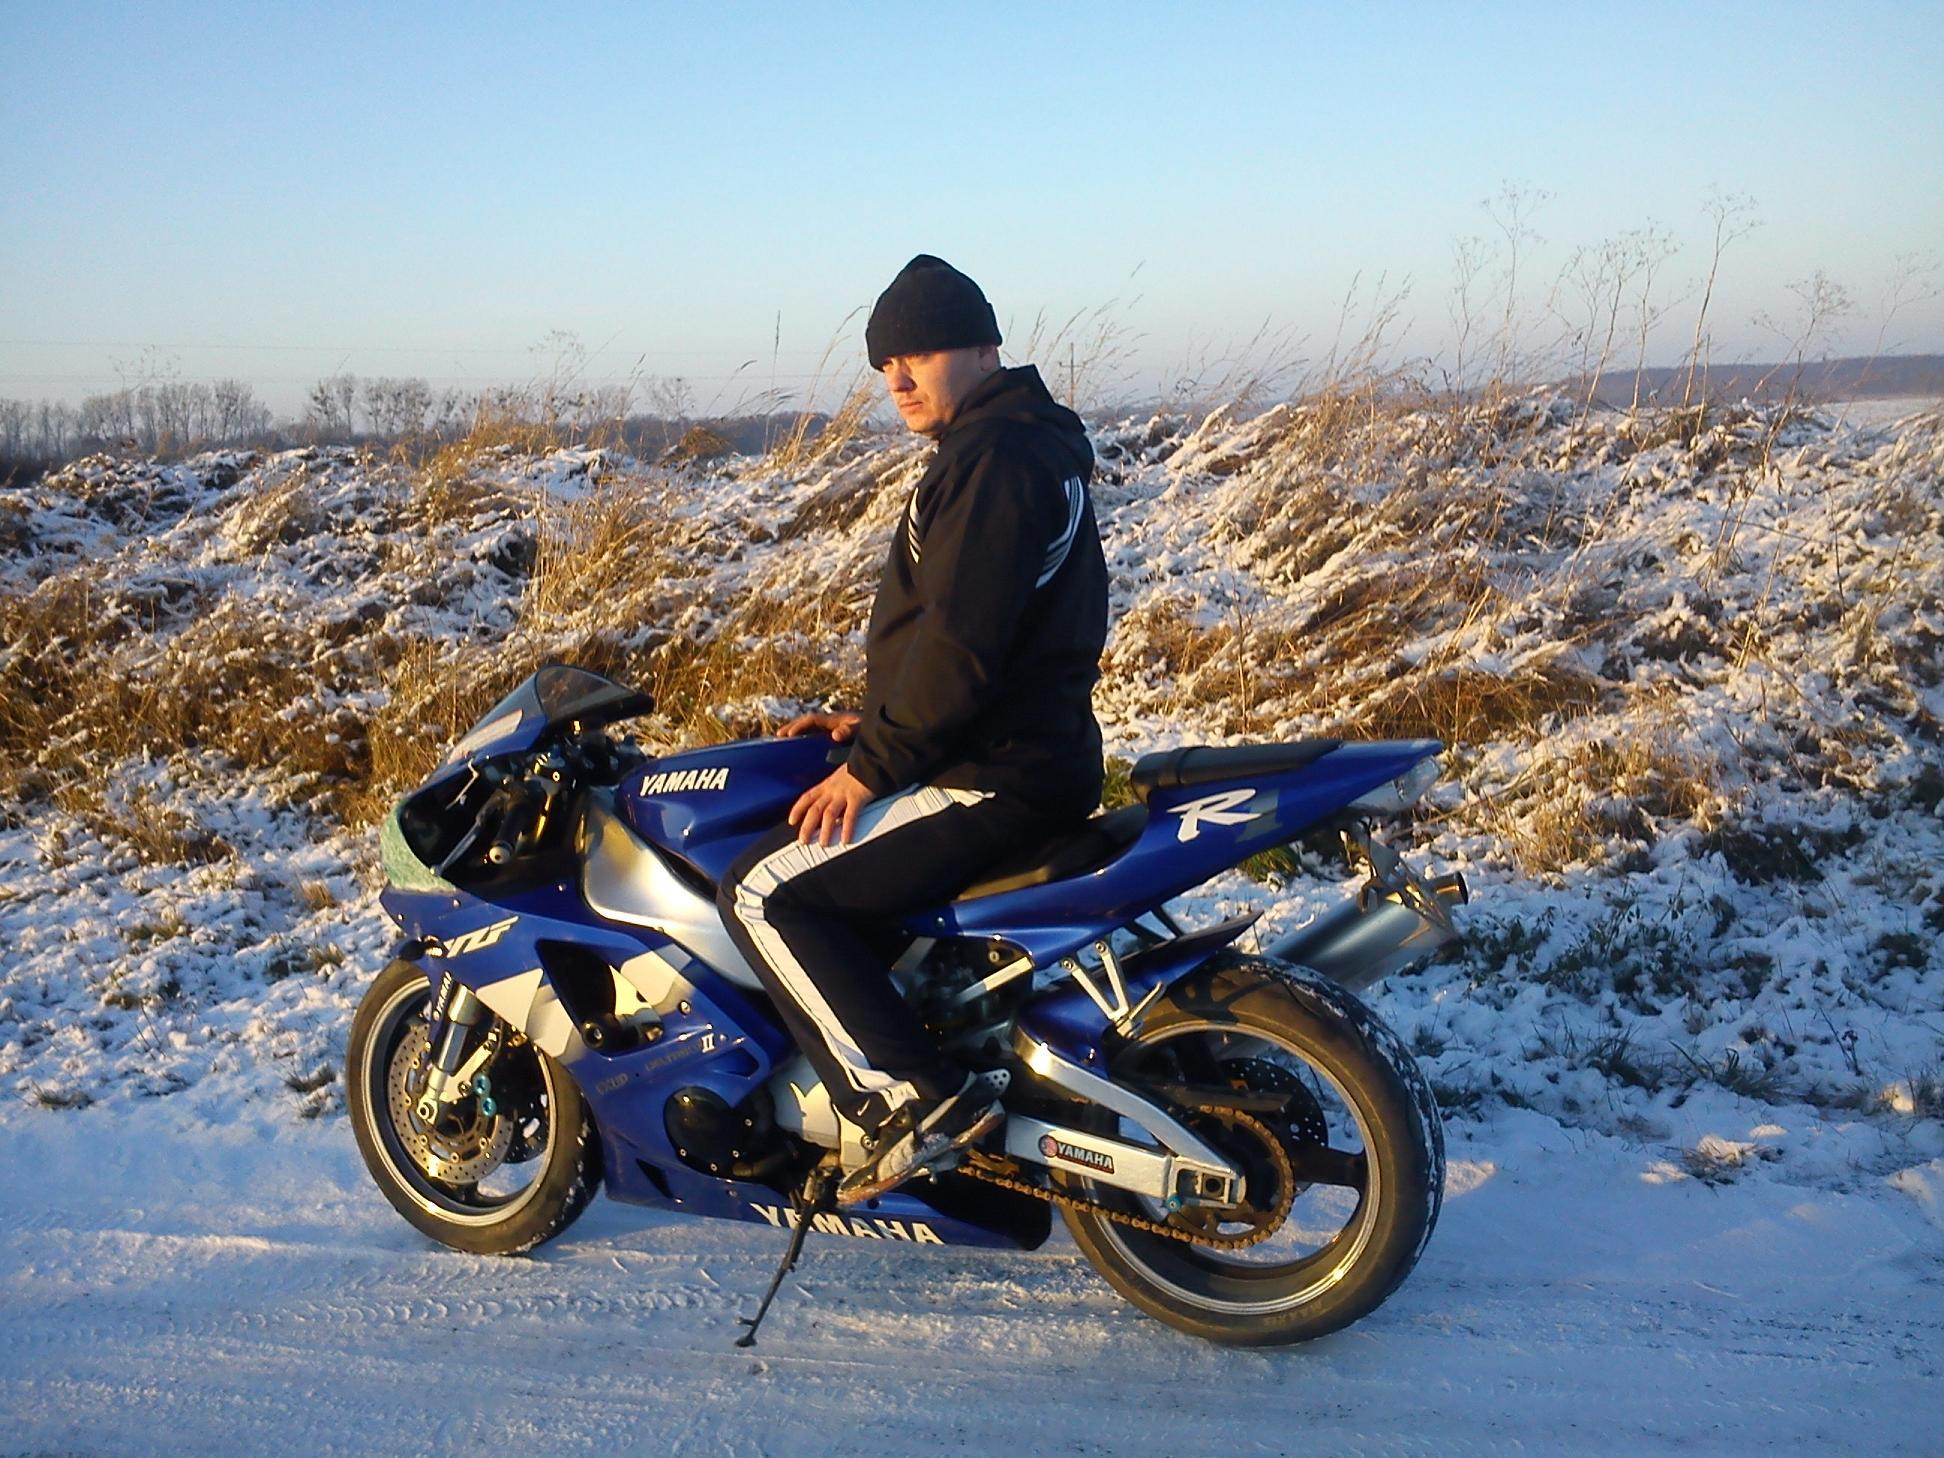 Yamaha R1 Rn04